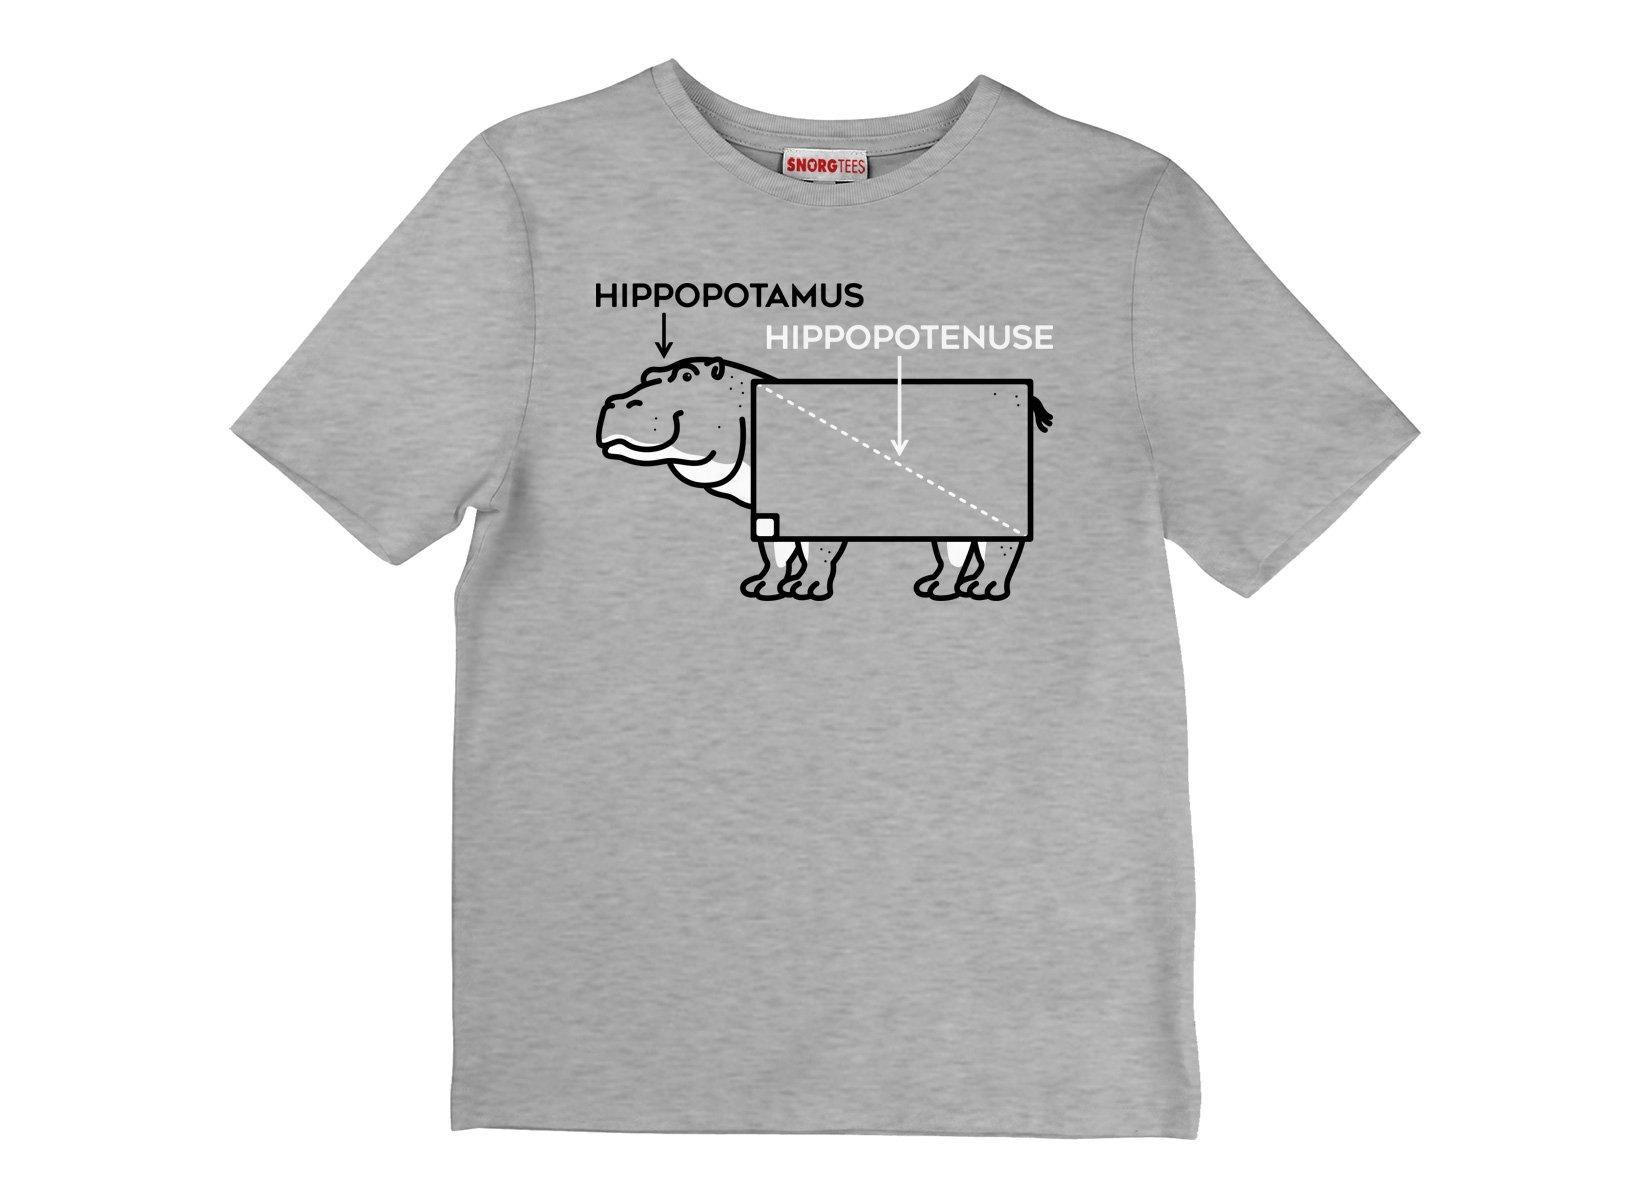 Hippopotenuse on Kids T-Shirt